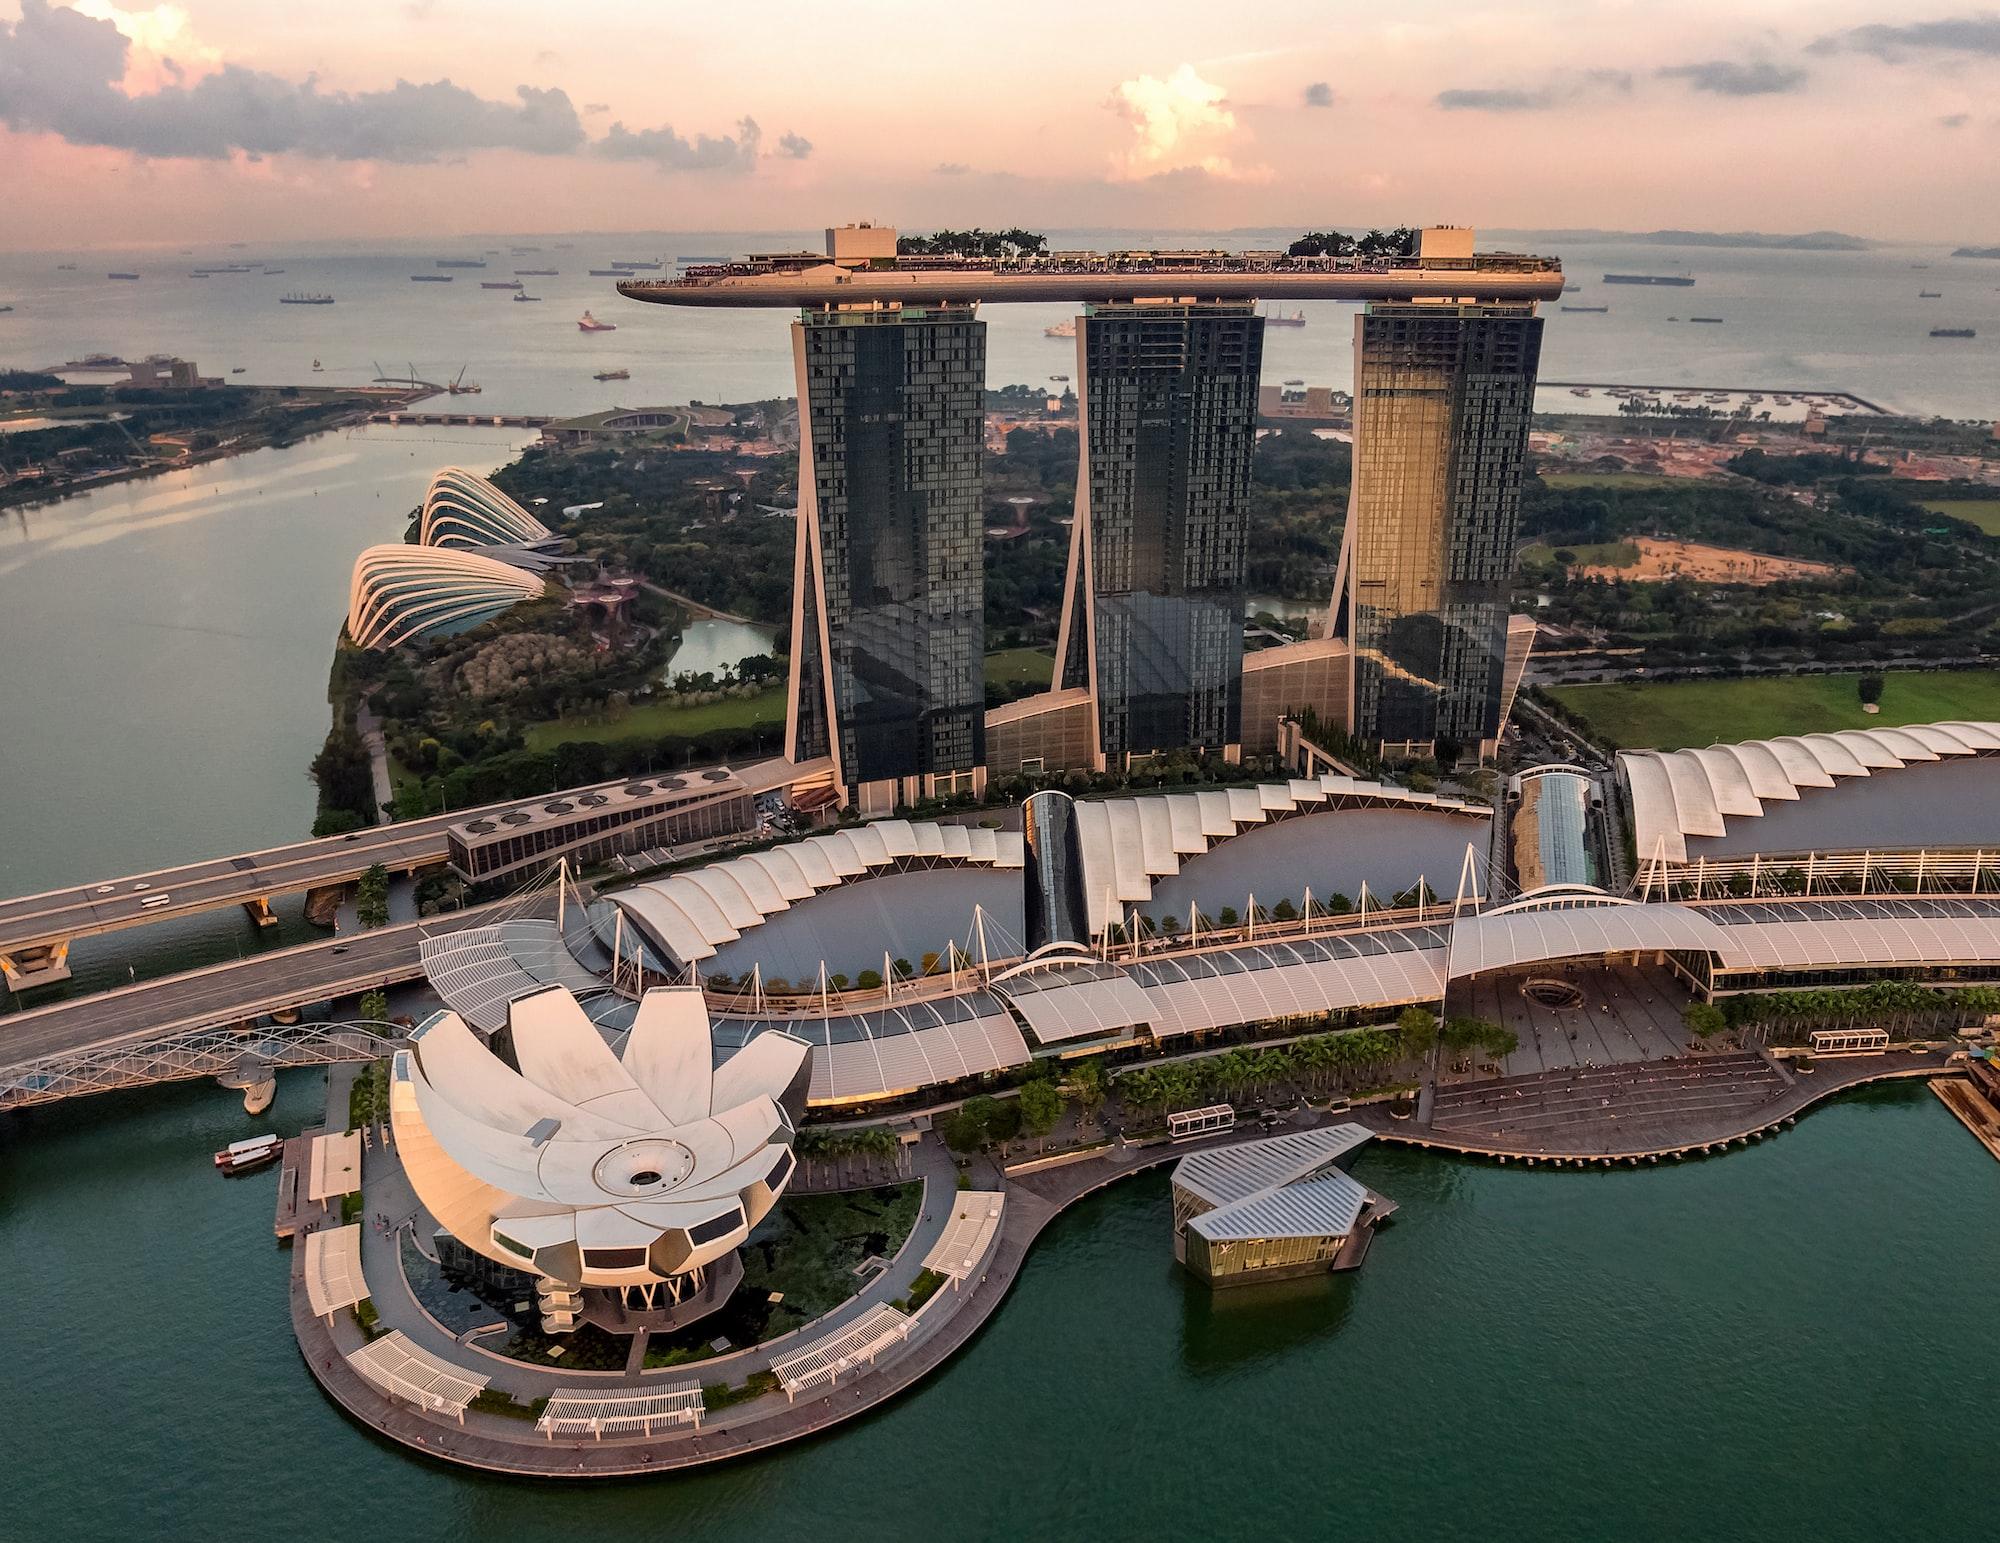 Singapore in sunset